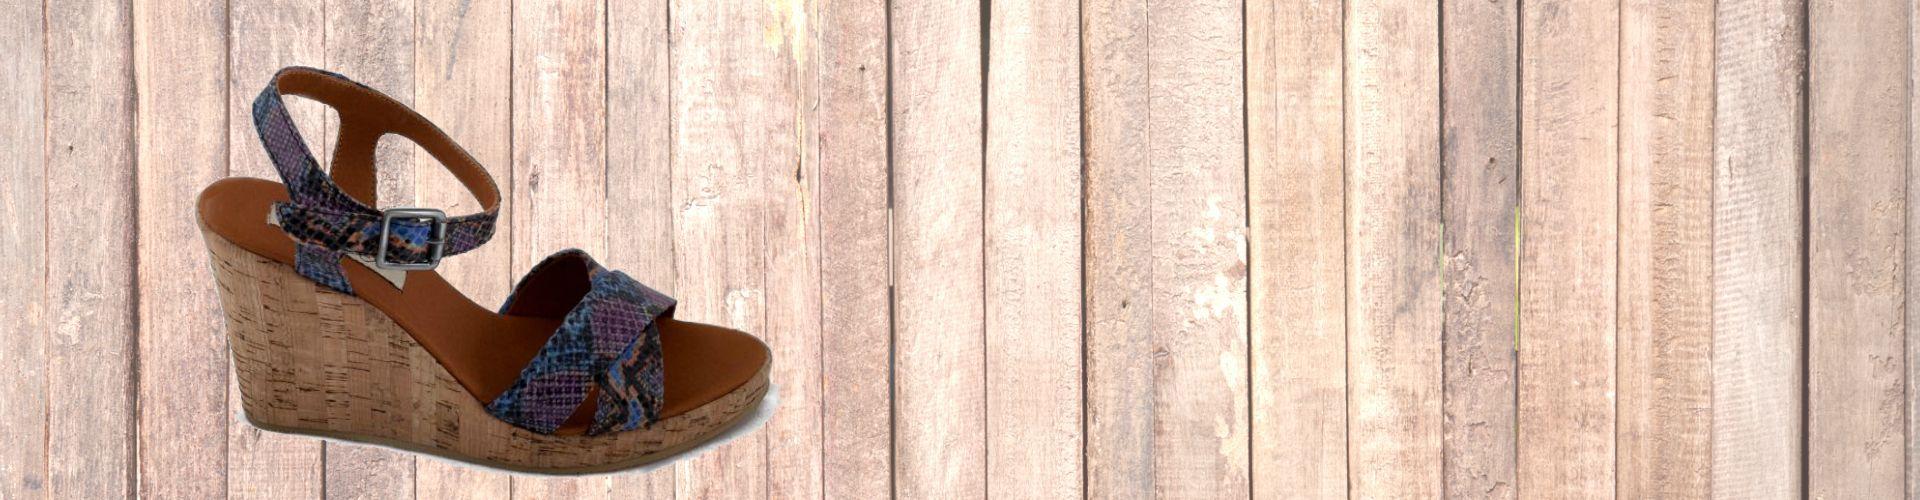 Sandały i klapki